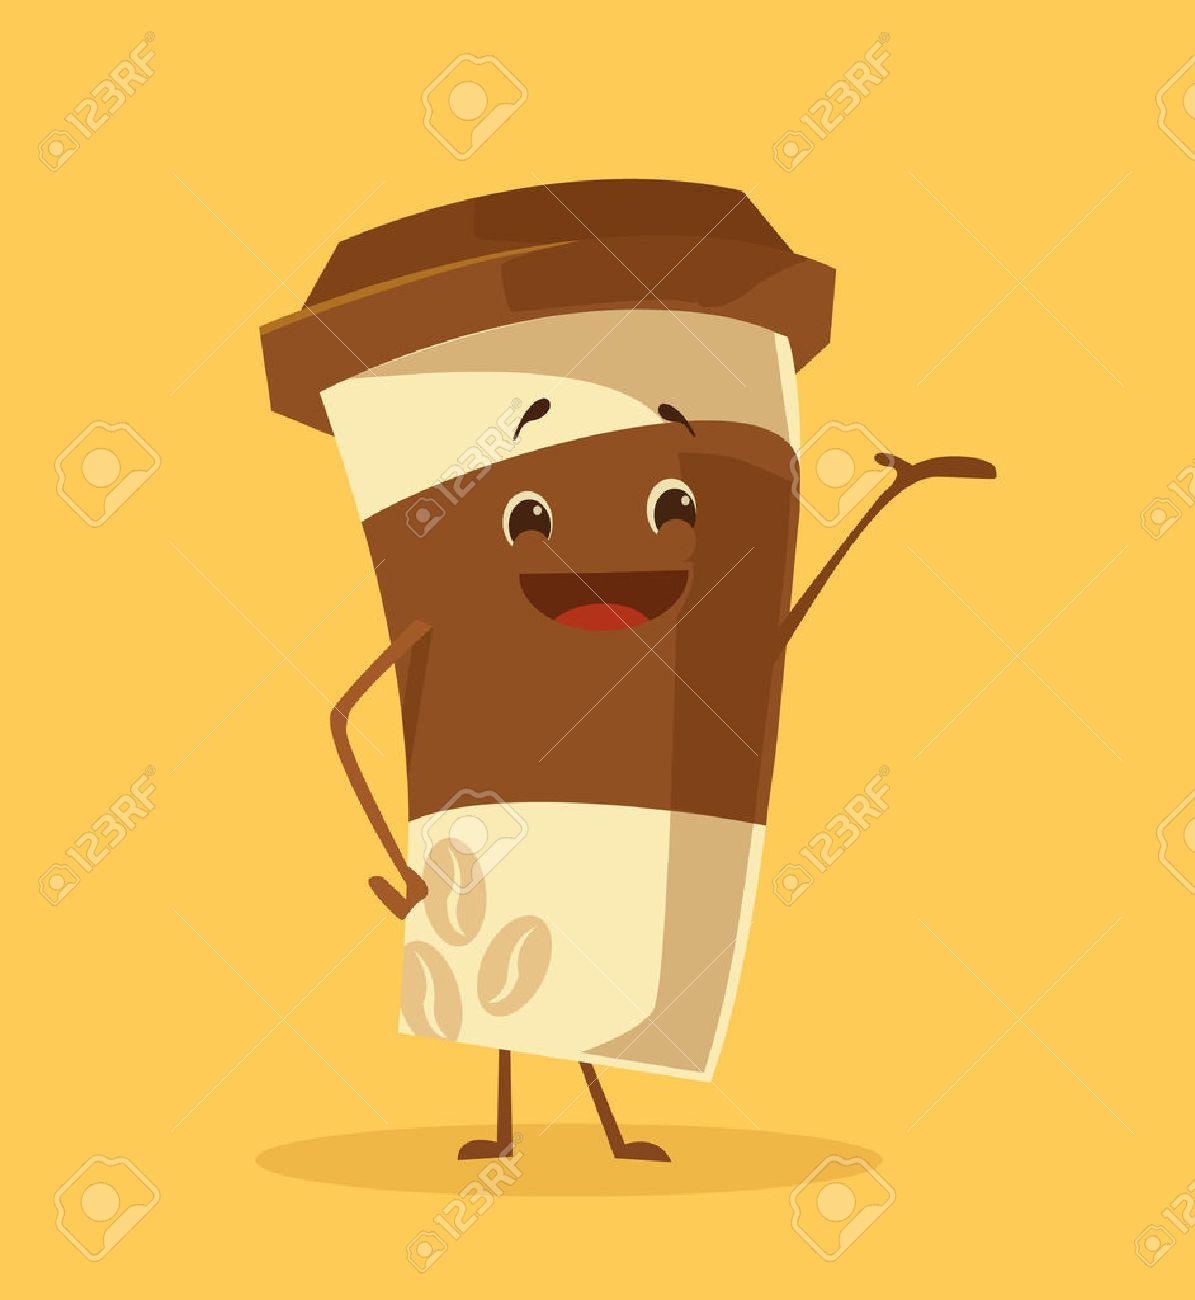 Cartoon coffee cup. Take away coffee. Happy cup of coffee. Vector flat cartoon illustration - 57777596